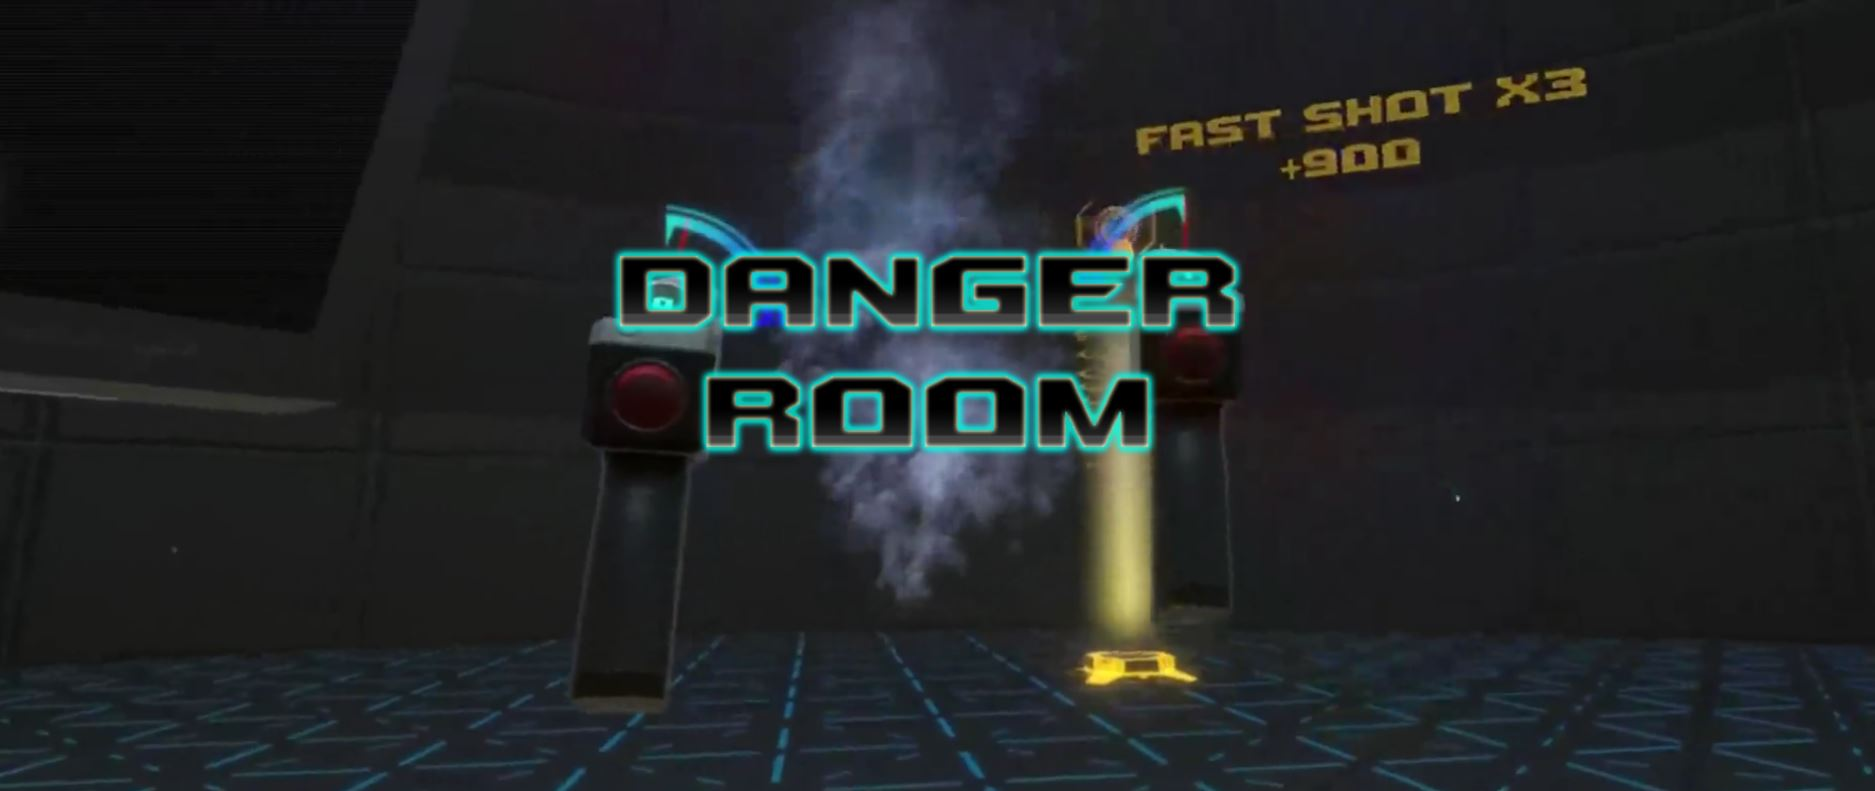 Danger Room Game Review